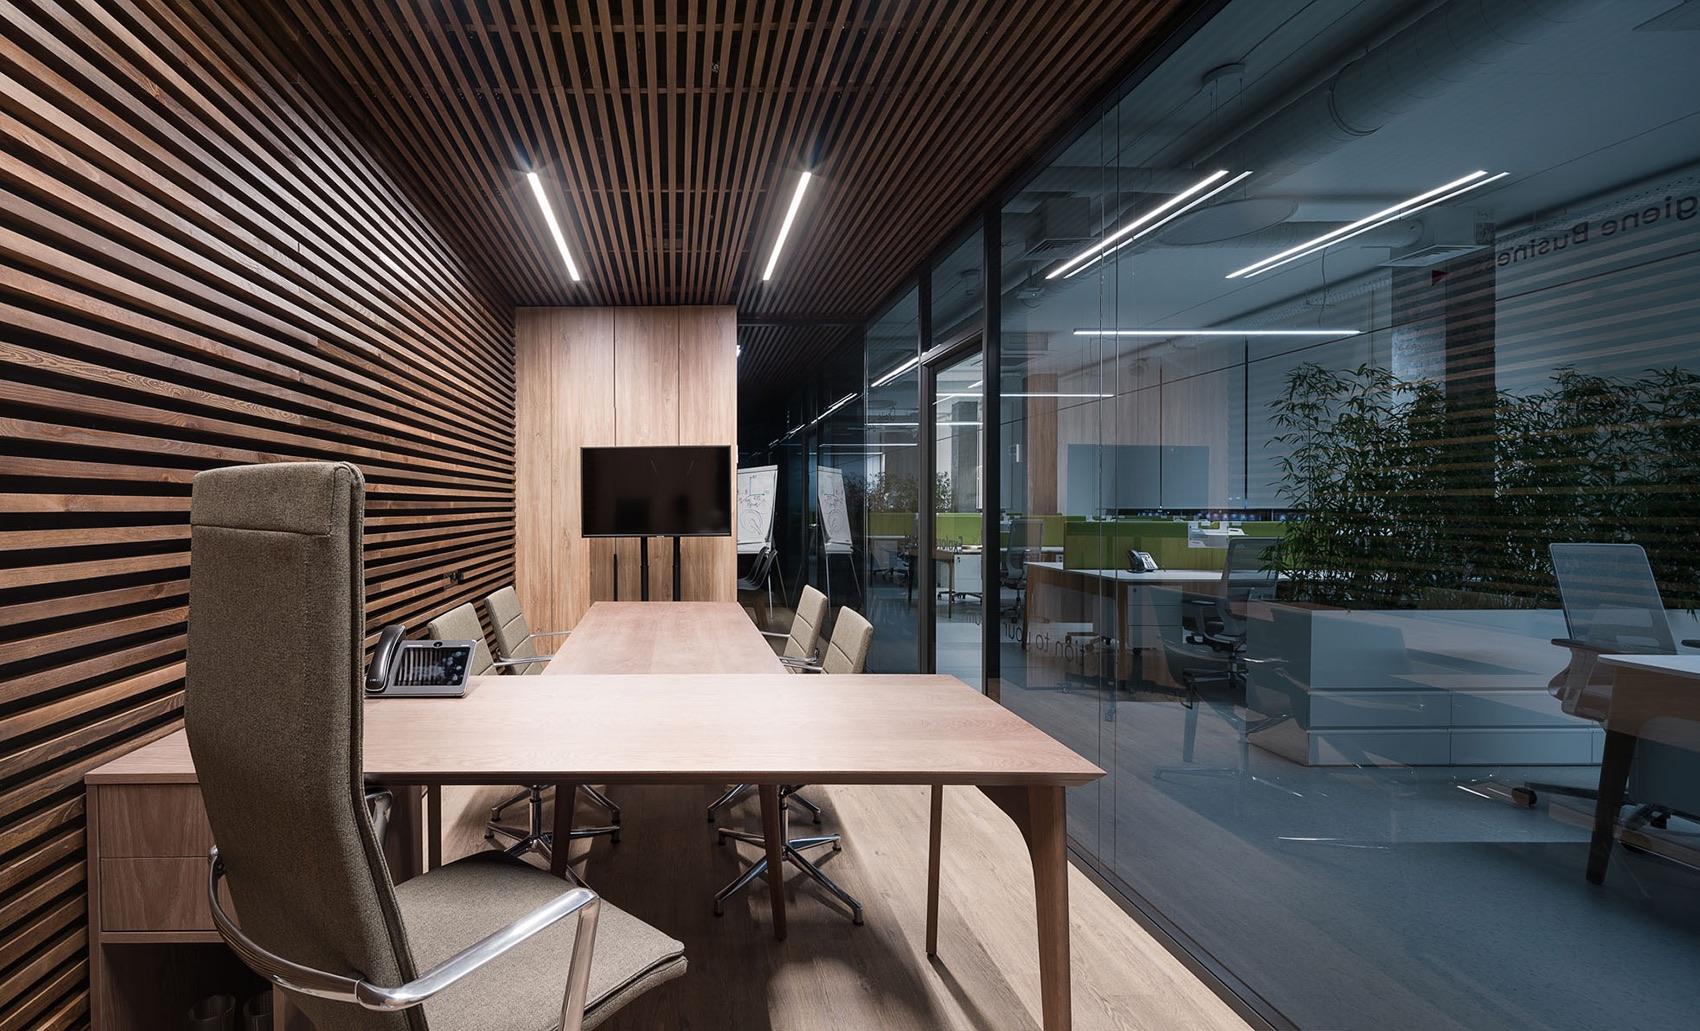 biosphere-corporation-office-10